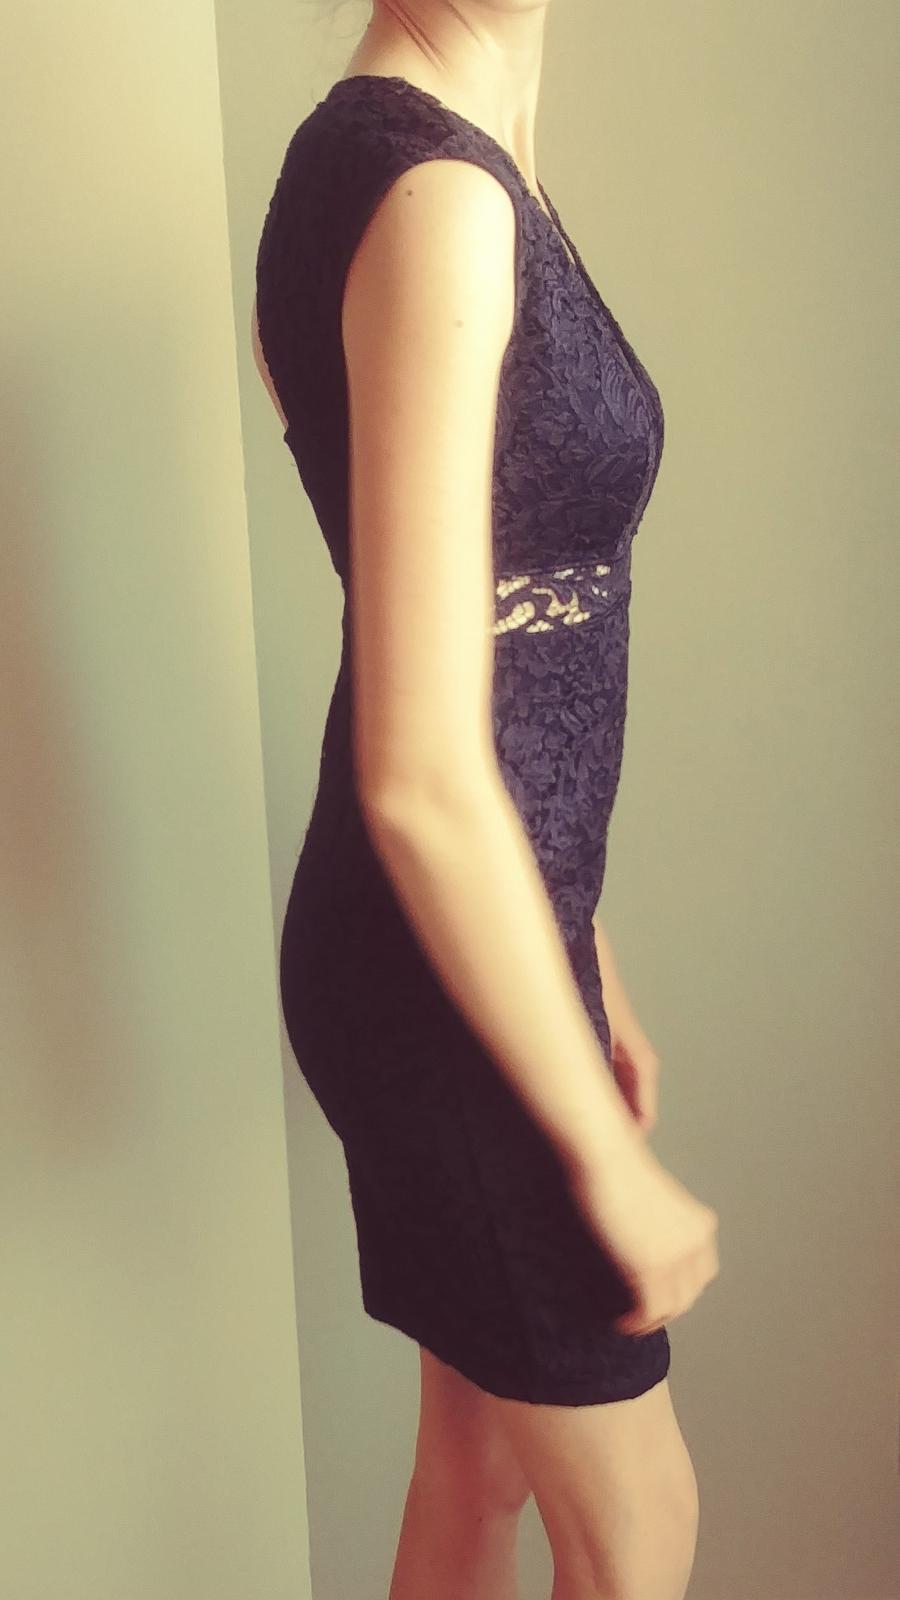 Tmavomodré sexi čipkované šaty 36/S-38/M - Obrázok č. 4